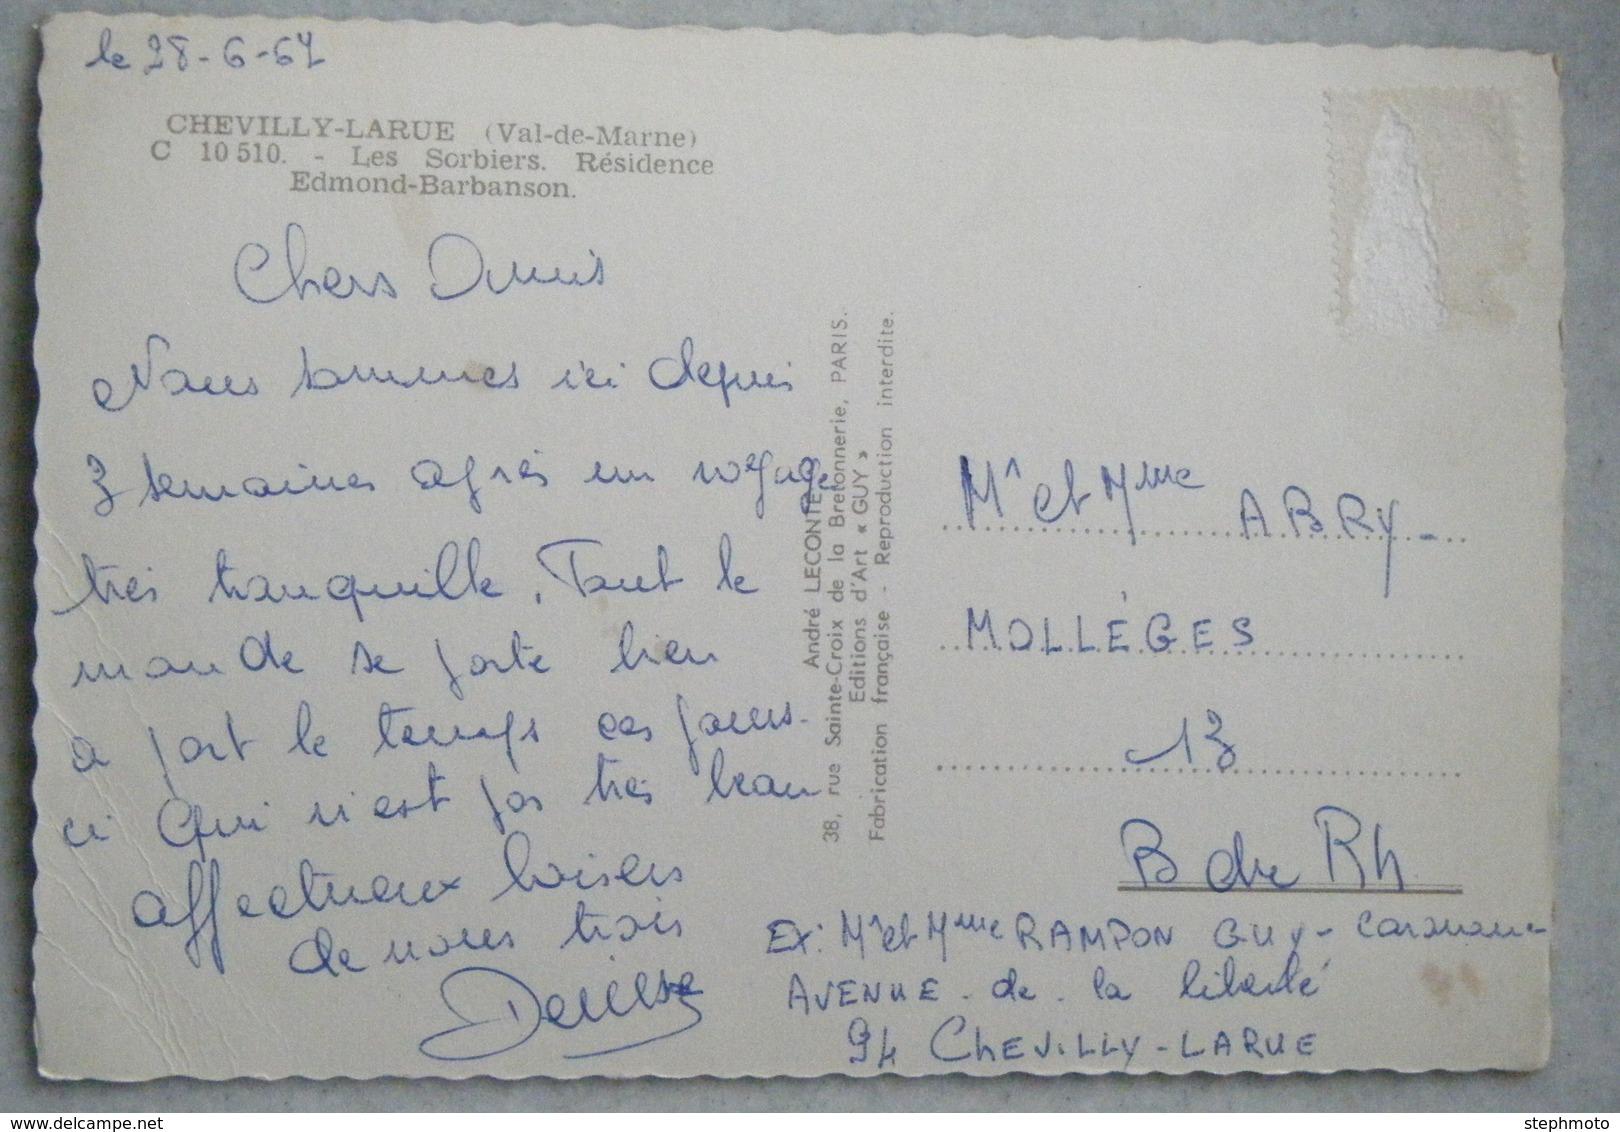 CHEVILLY LARUE-LES SORBIERS-RESIDENCE EDMOND BARBANSON - Chevilly Larue